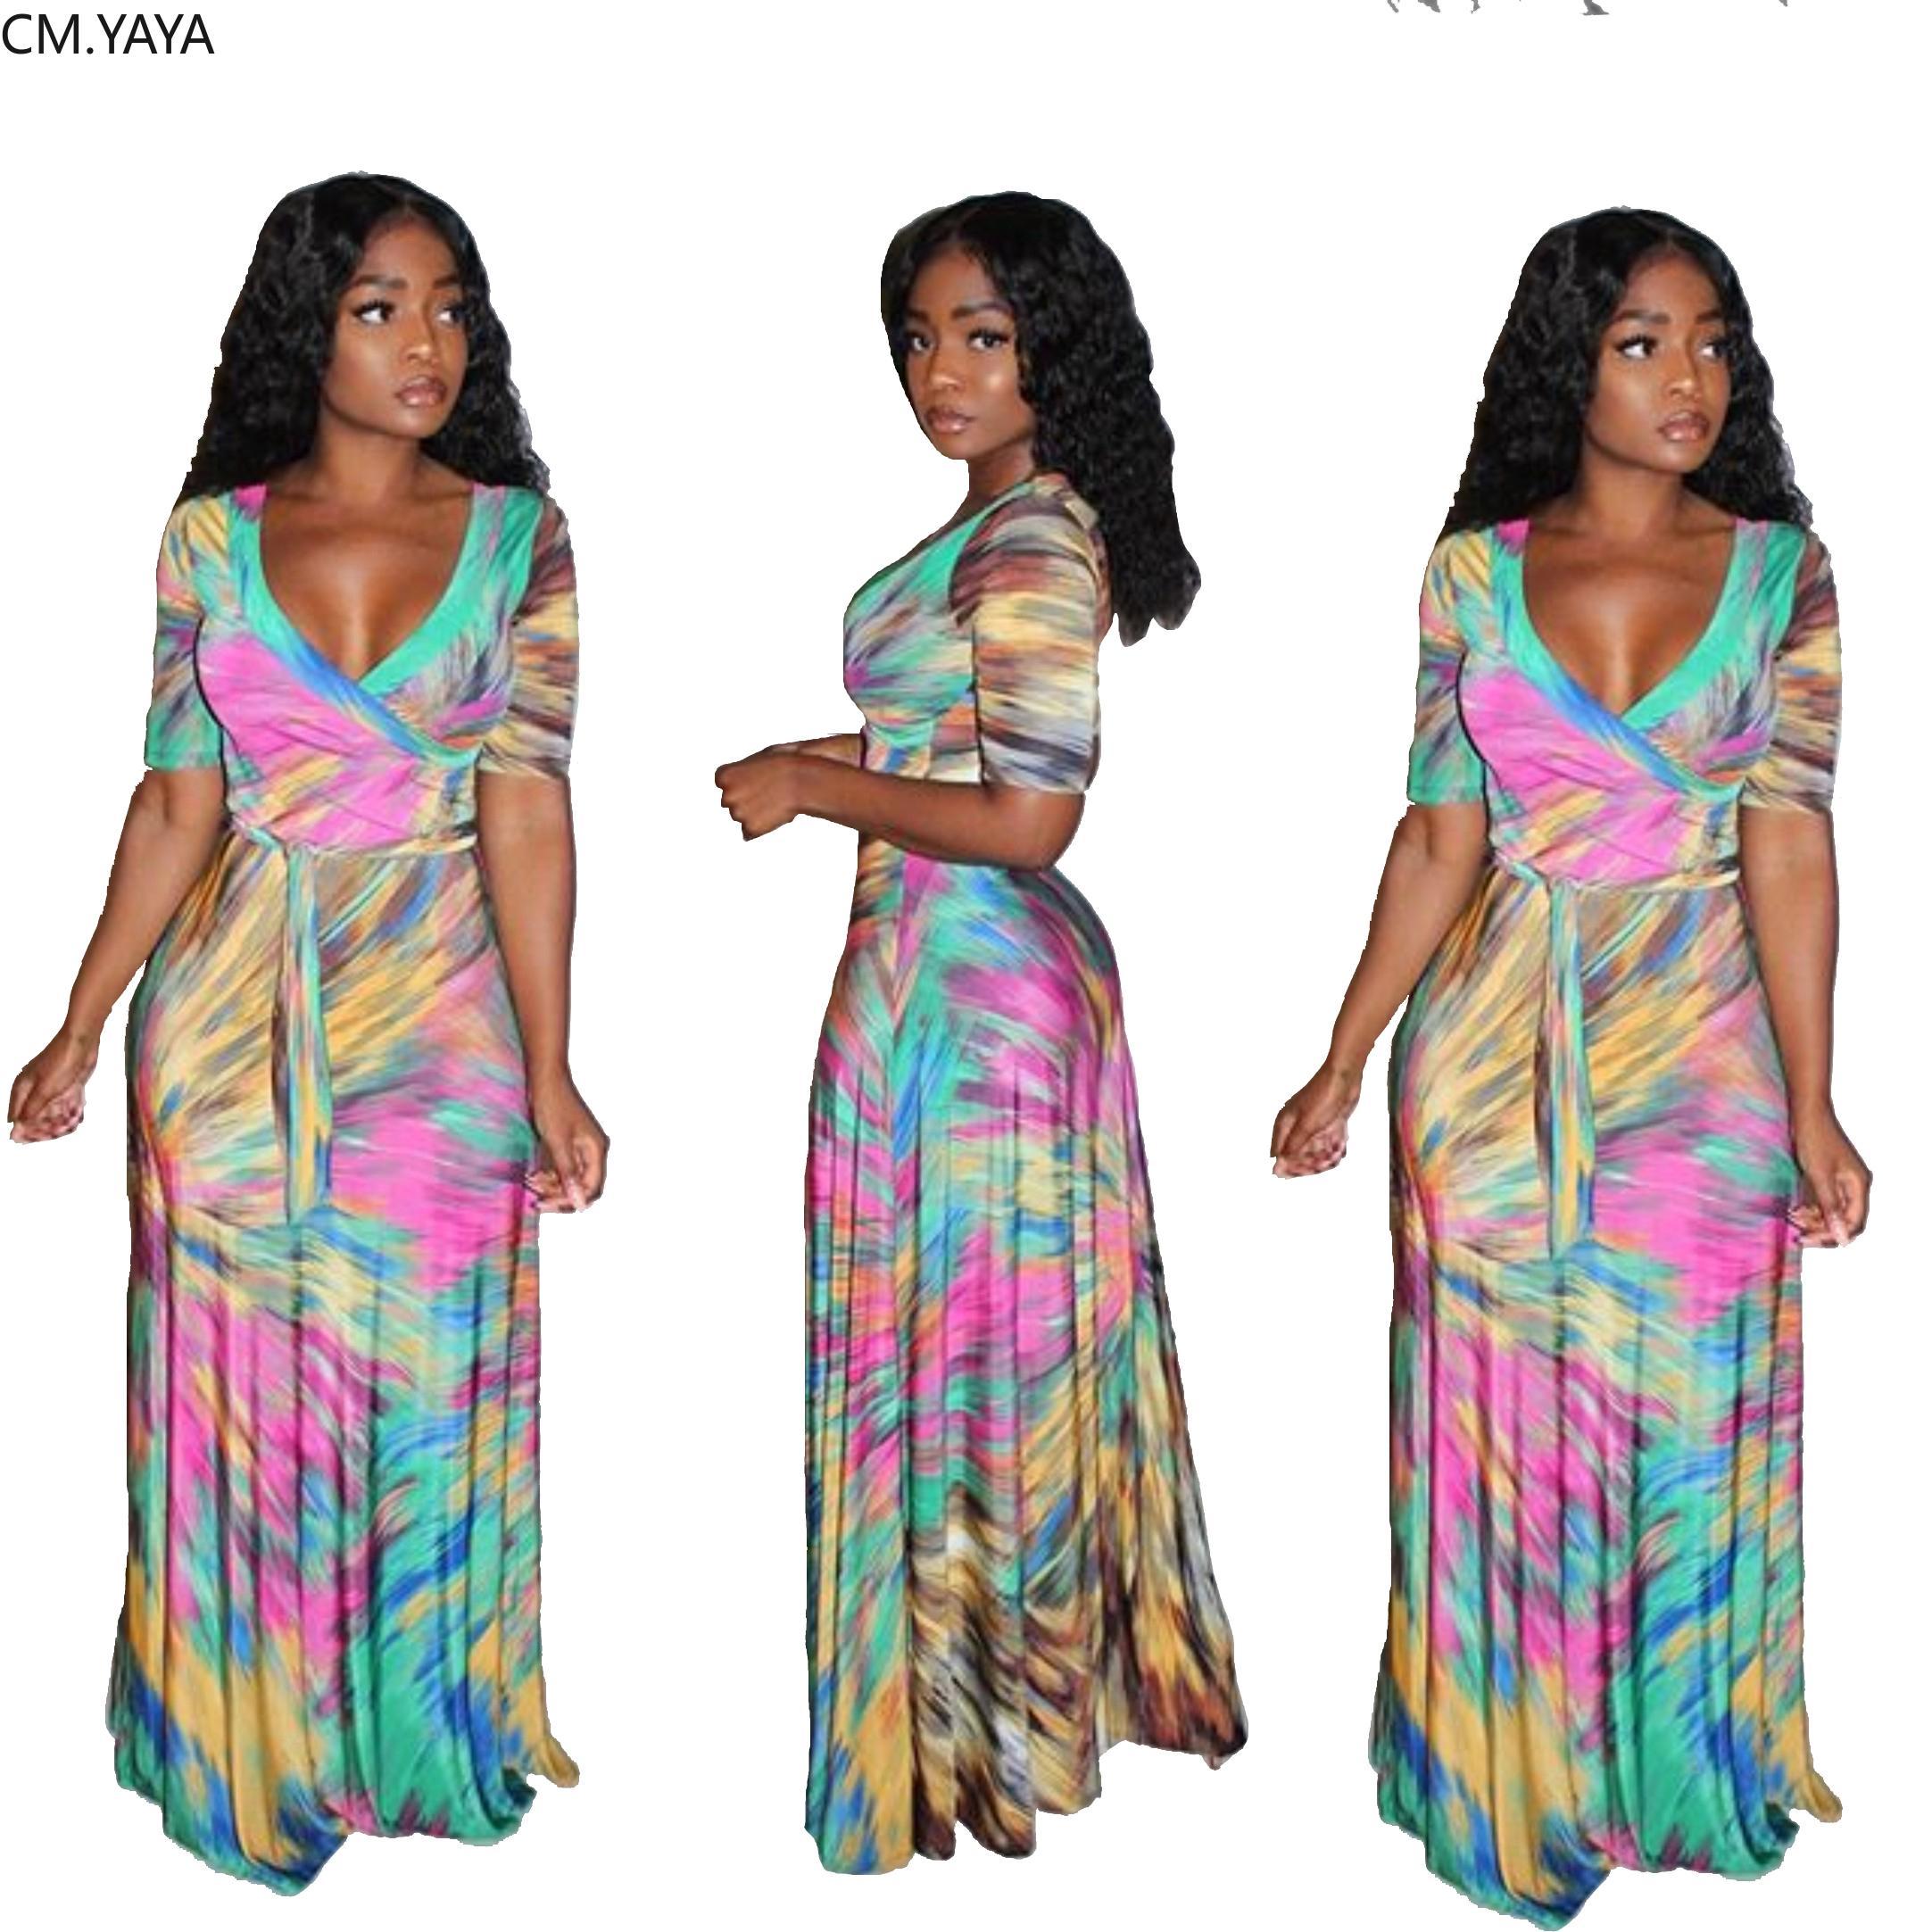 Frauen-Sommer-Paisley Krawatten-Print V-Ausschnitt Maxikleid Stretch Short Sleeve Bodycon Fit Flare Nacht lang Kleider Vestidos